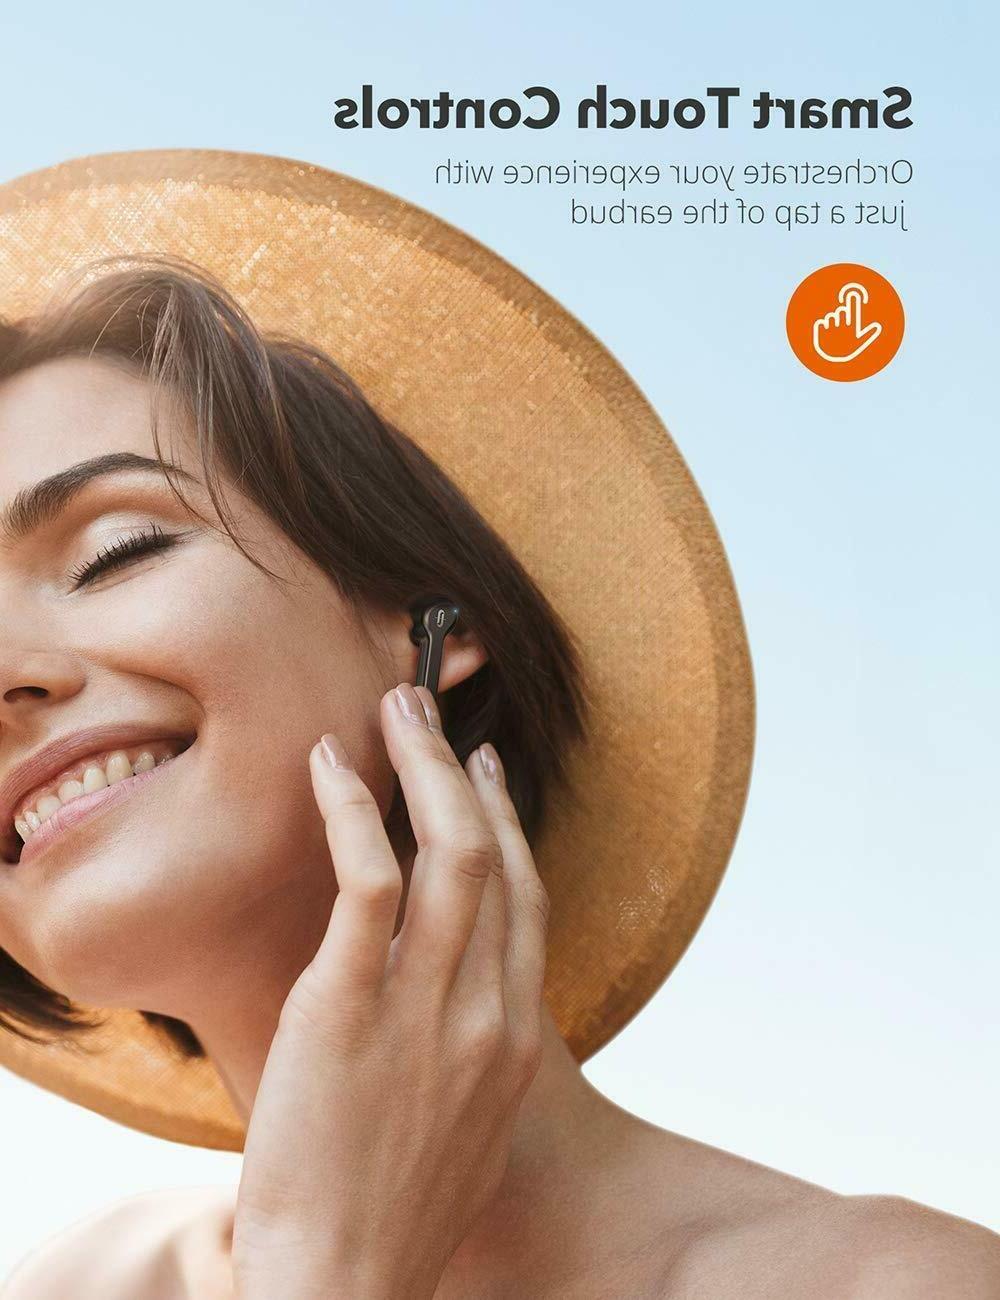 TaoTronics 53 Wireless Earbuds TWS Earphones